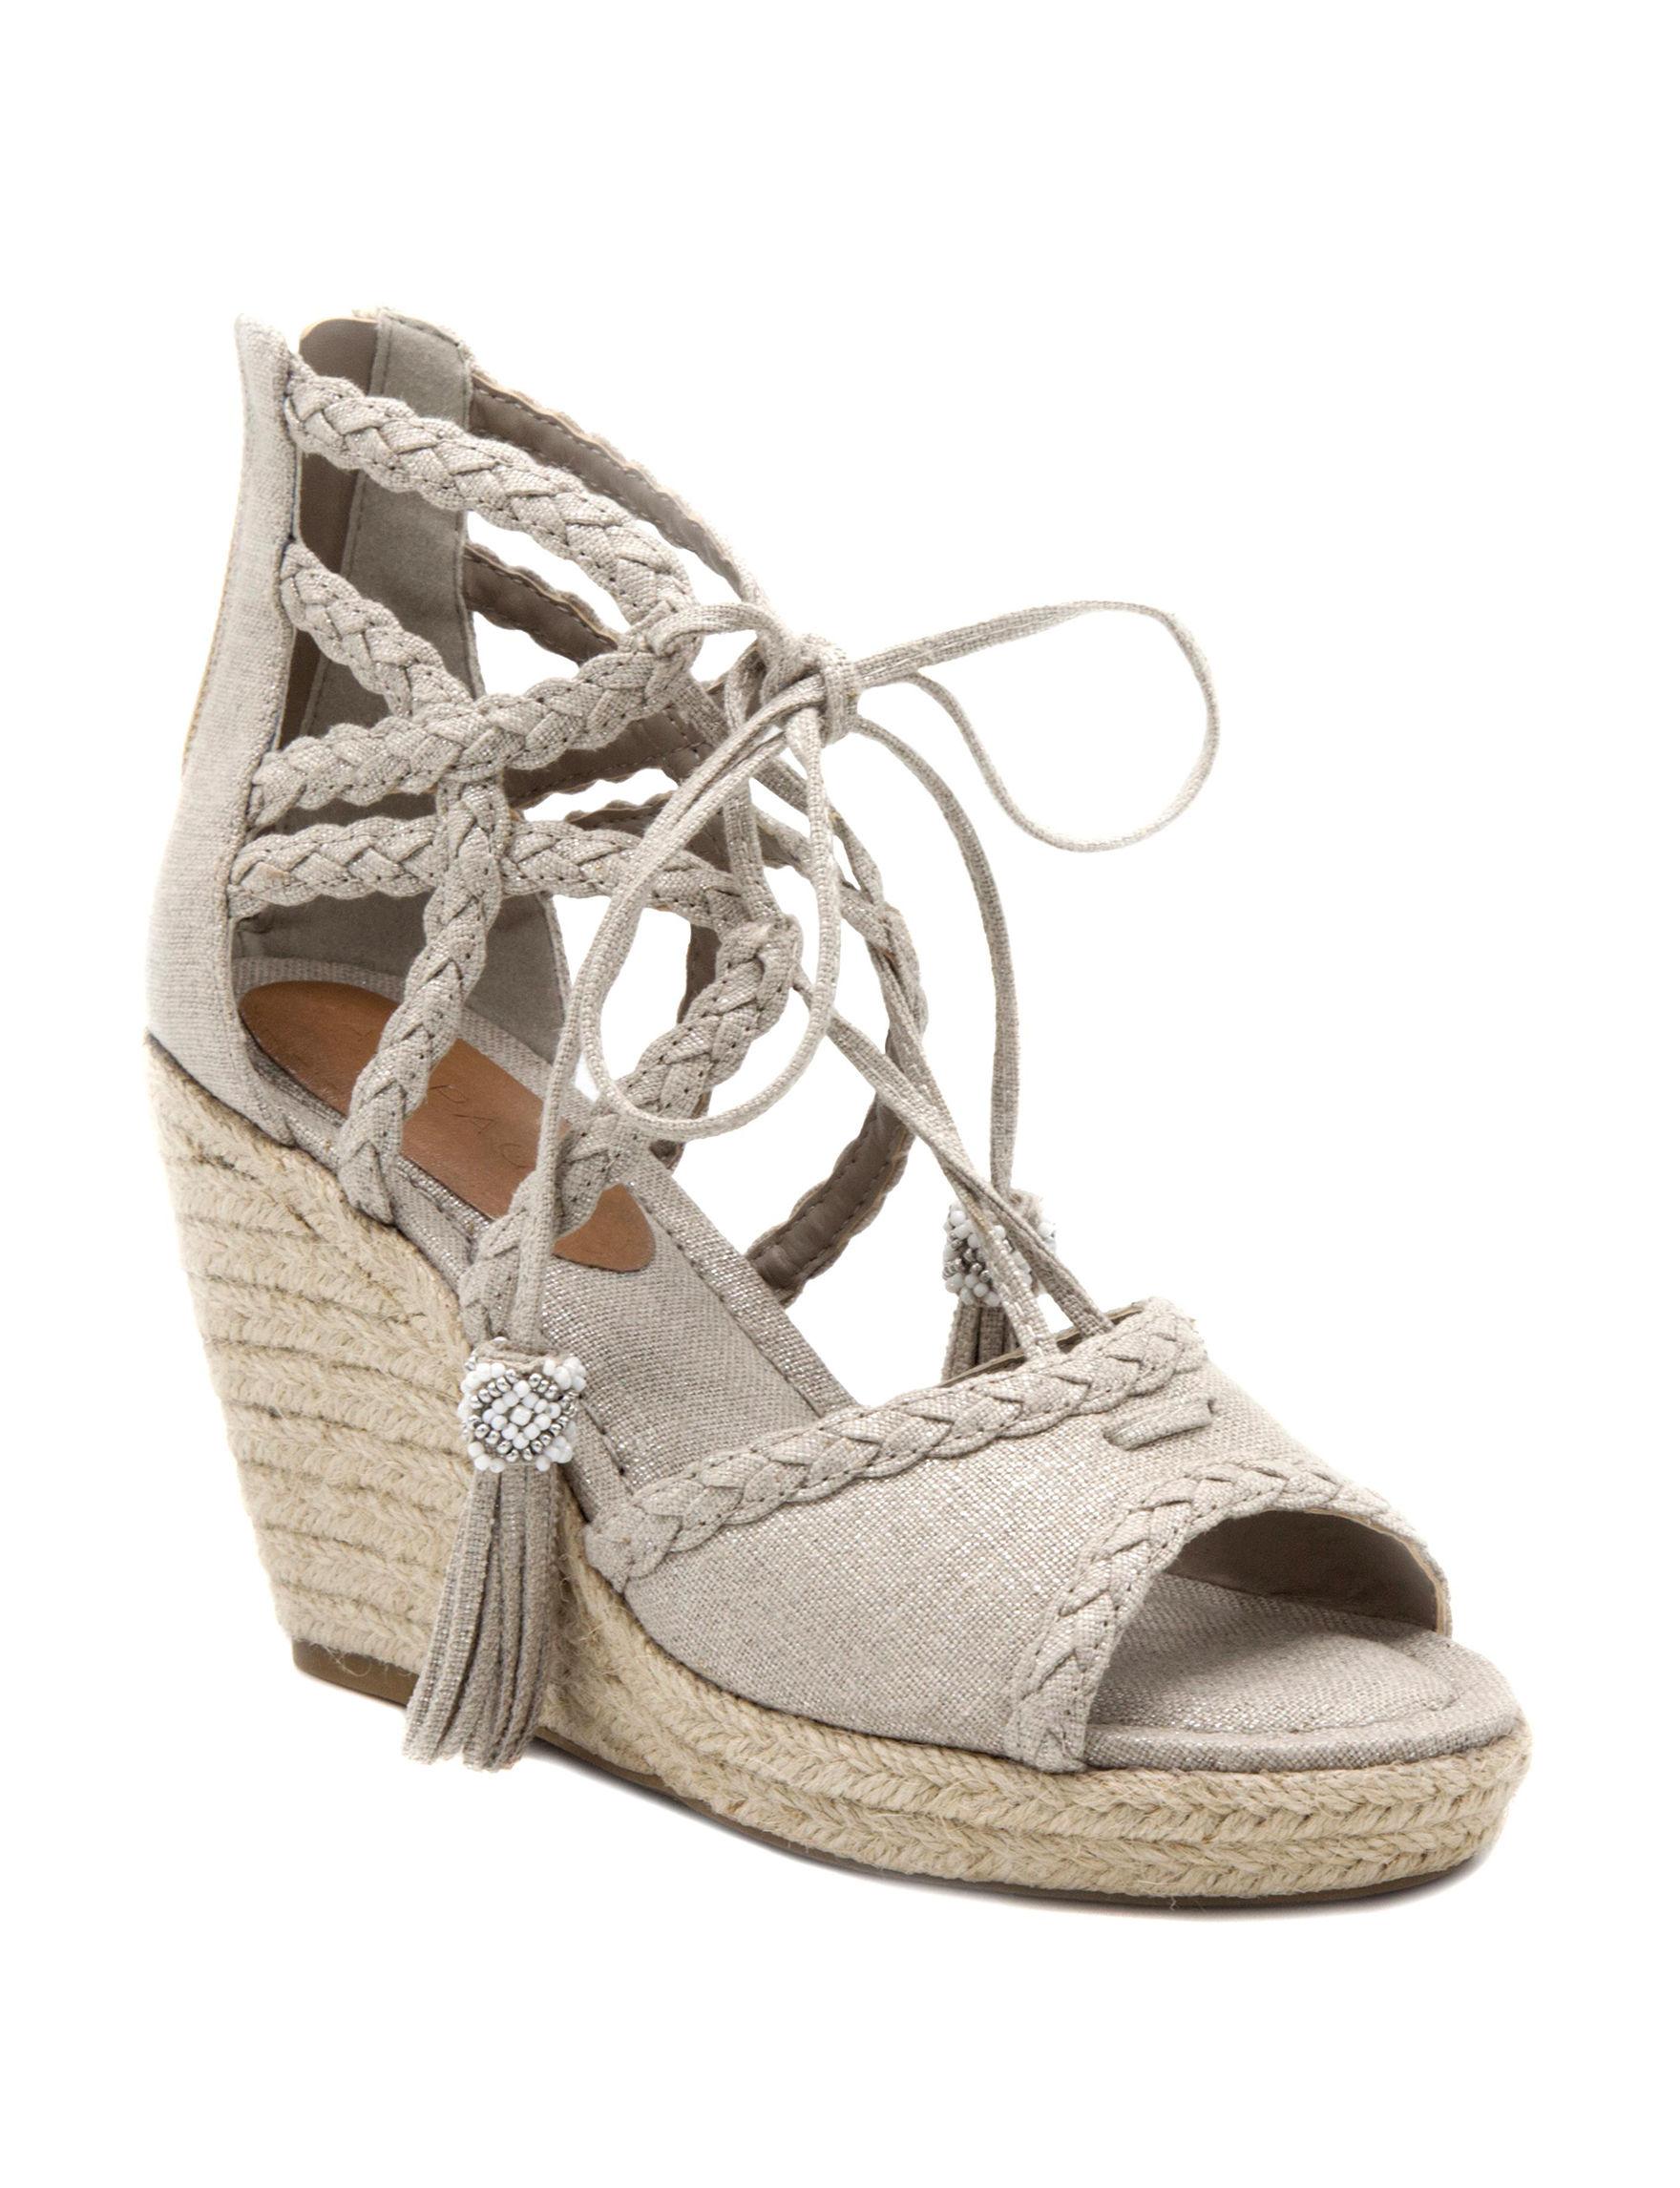 Rampage Natural Wedge Sandals